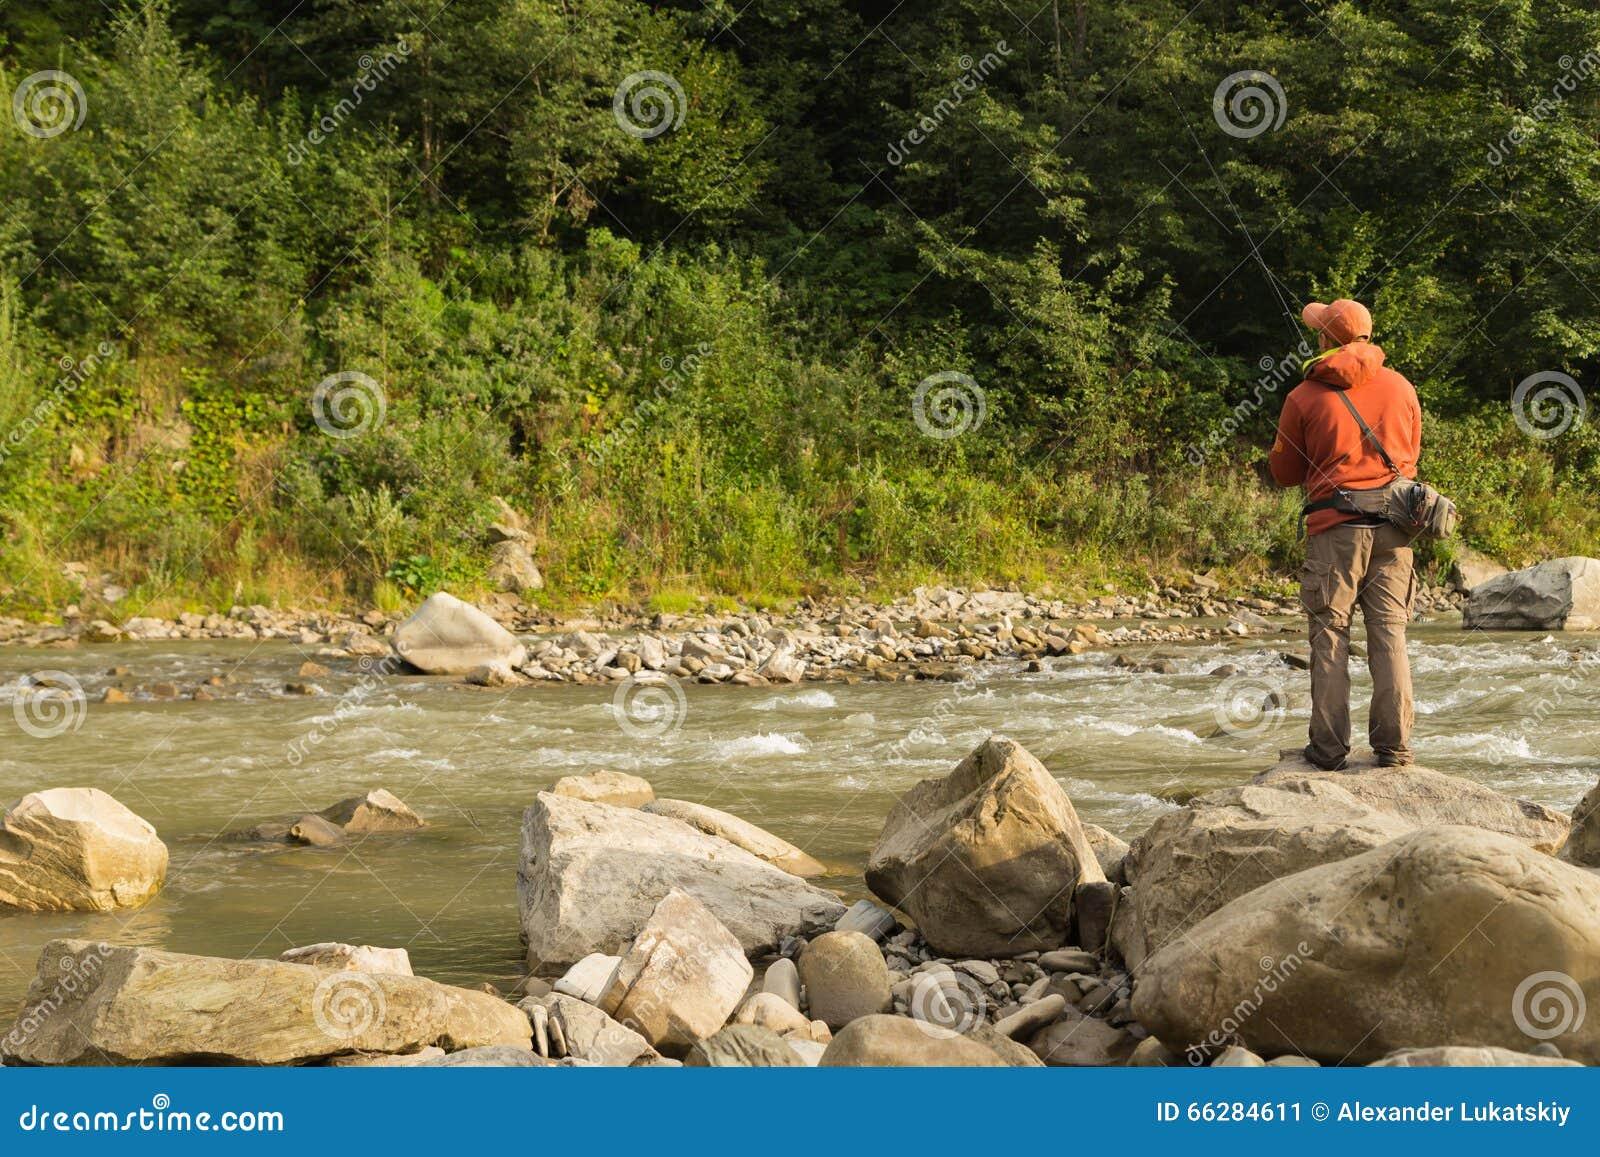 trout lake catholic single men Pokegama lake, leech lake, winnibigoshish, bowstring, upper red, cass lake, mille lacs, trout,  we would like you to come hang loose outdoors with us.